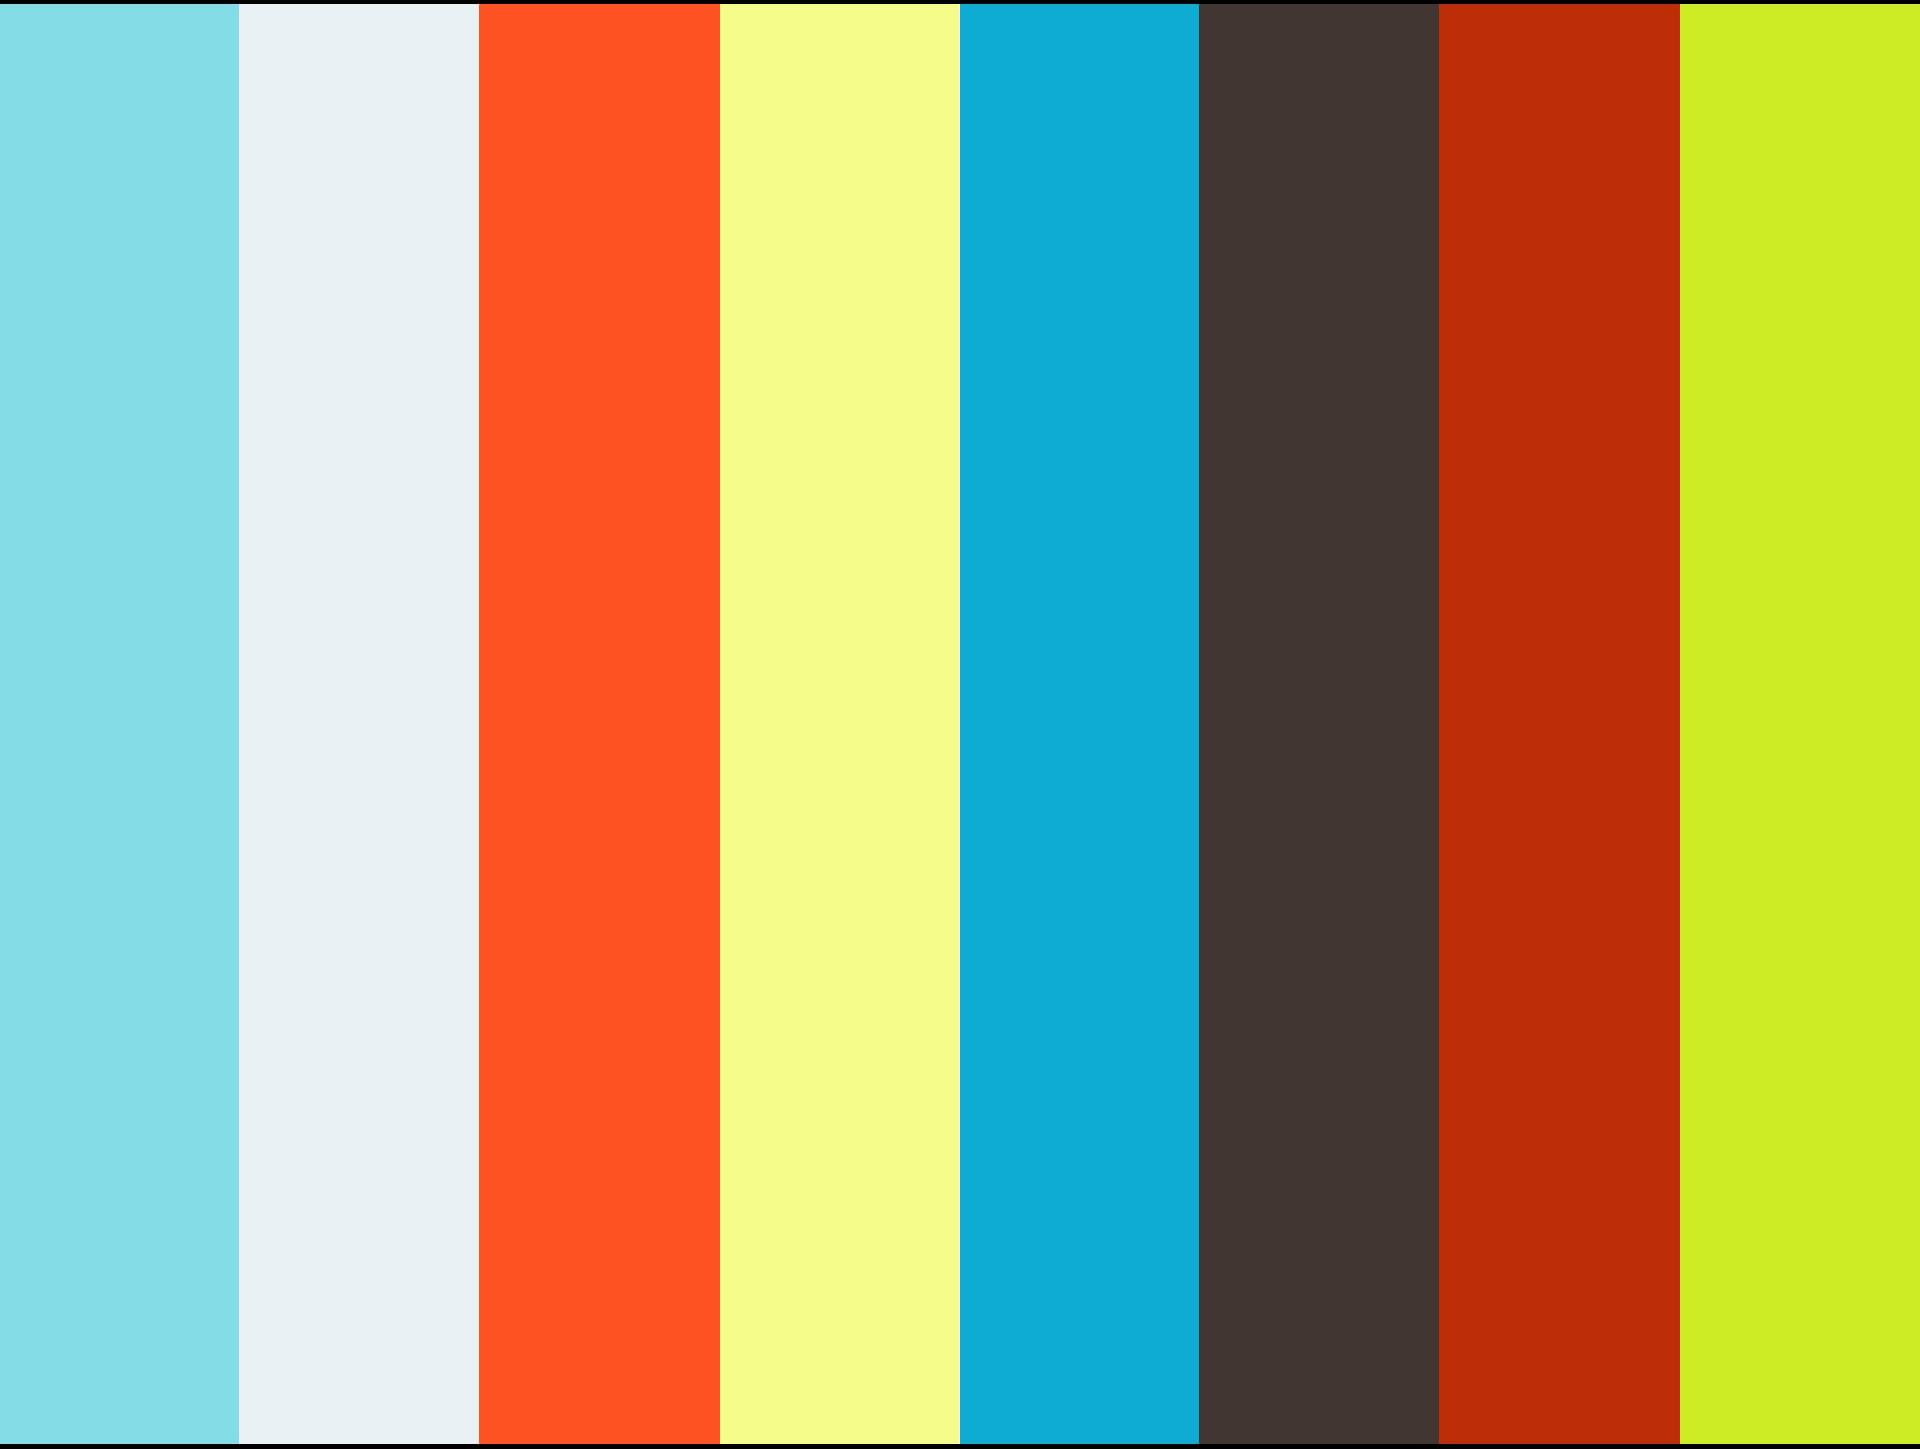 fallback-no-image-2111